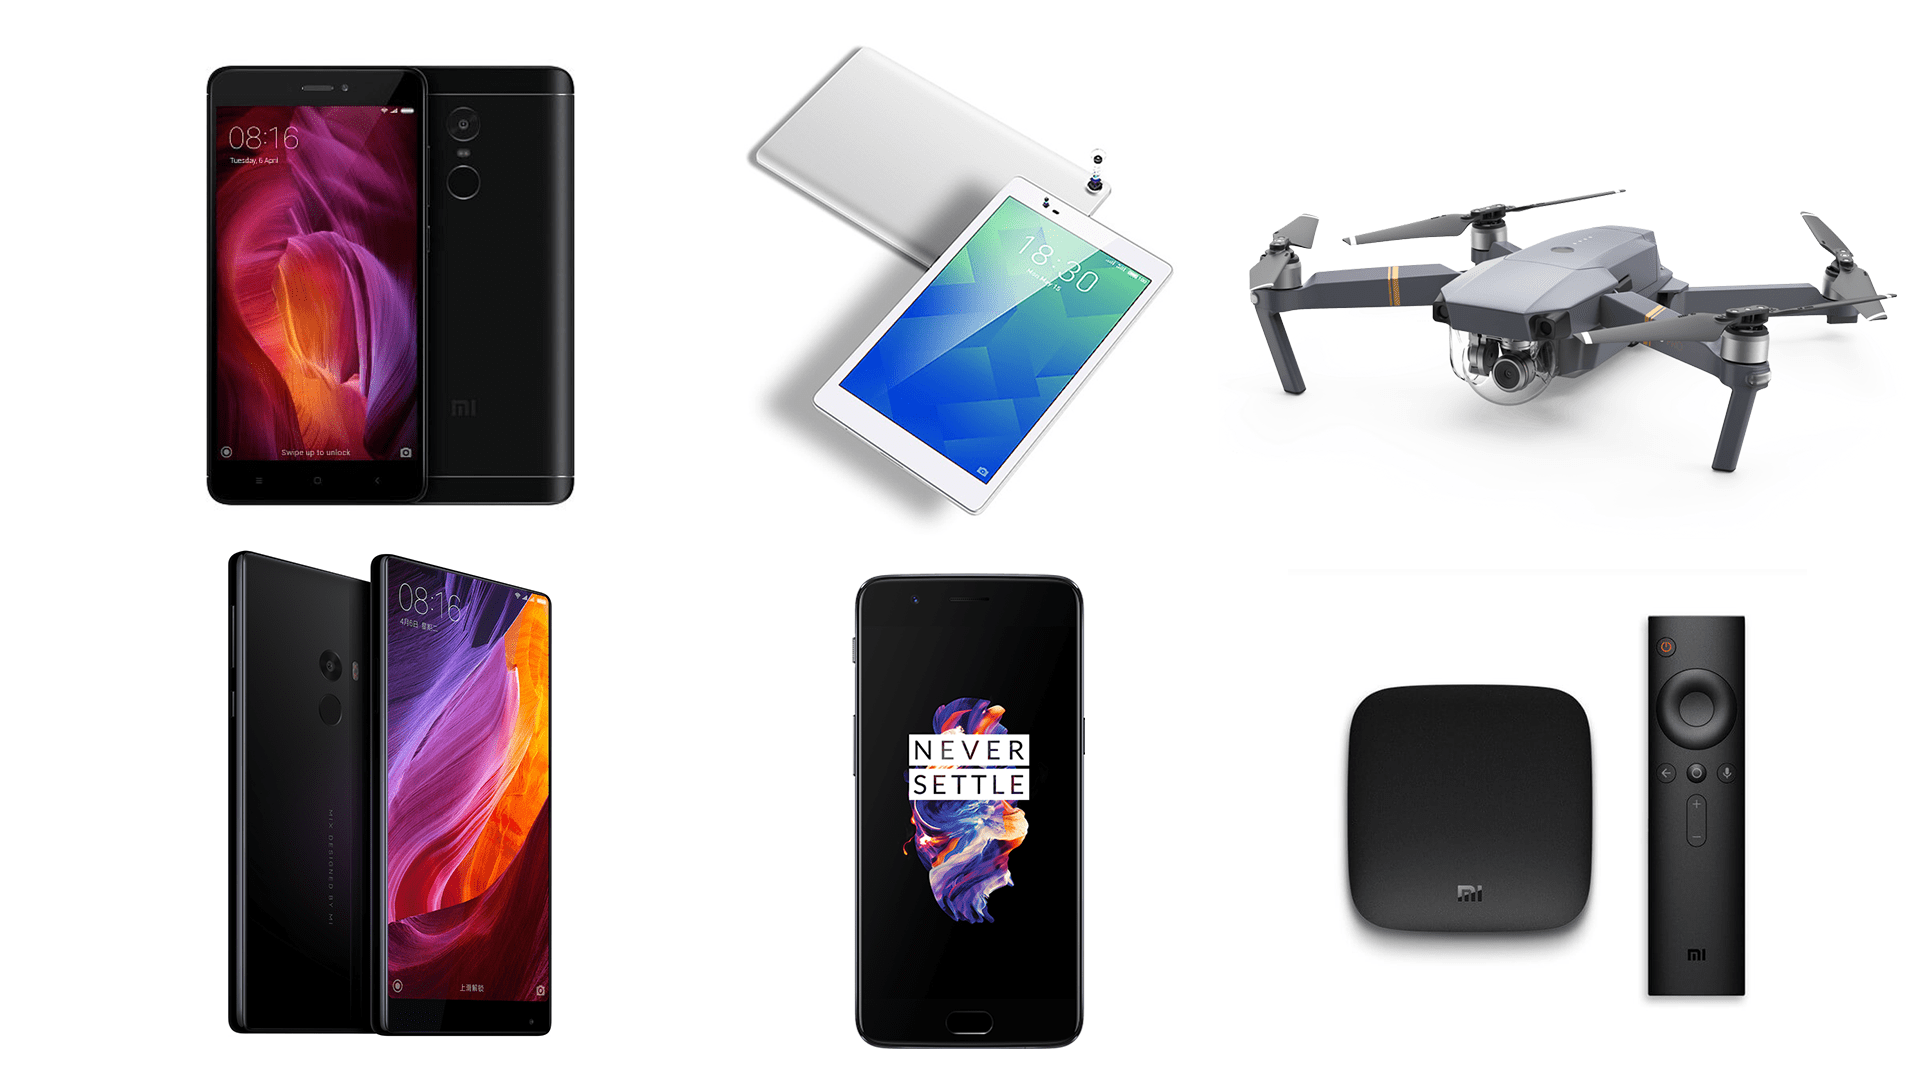 6 offres de la semaine sur GearBest : Xiaomi Mi Mix 2, Lenovo P8, Xiaomi Redmi Note 4, DJI Mavic Pro, One Plus 5 et Xiaomi Mi Box